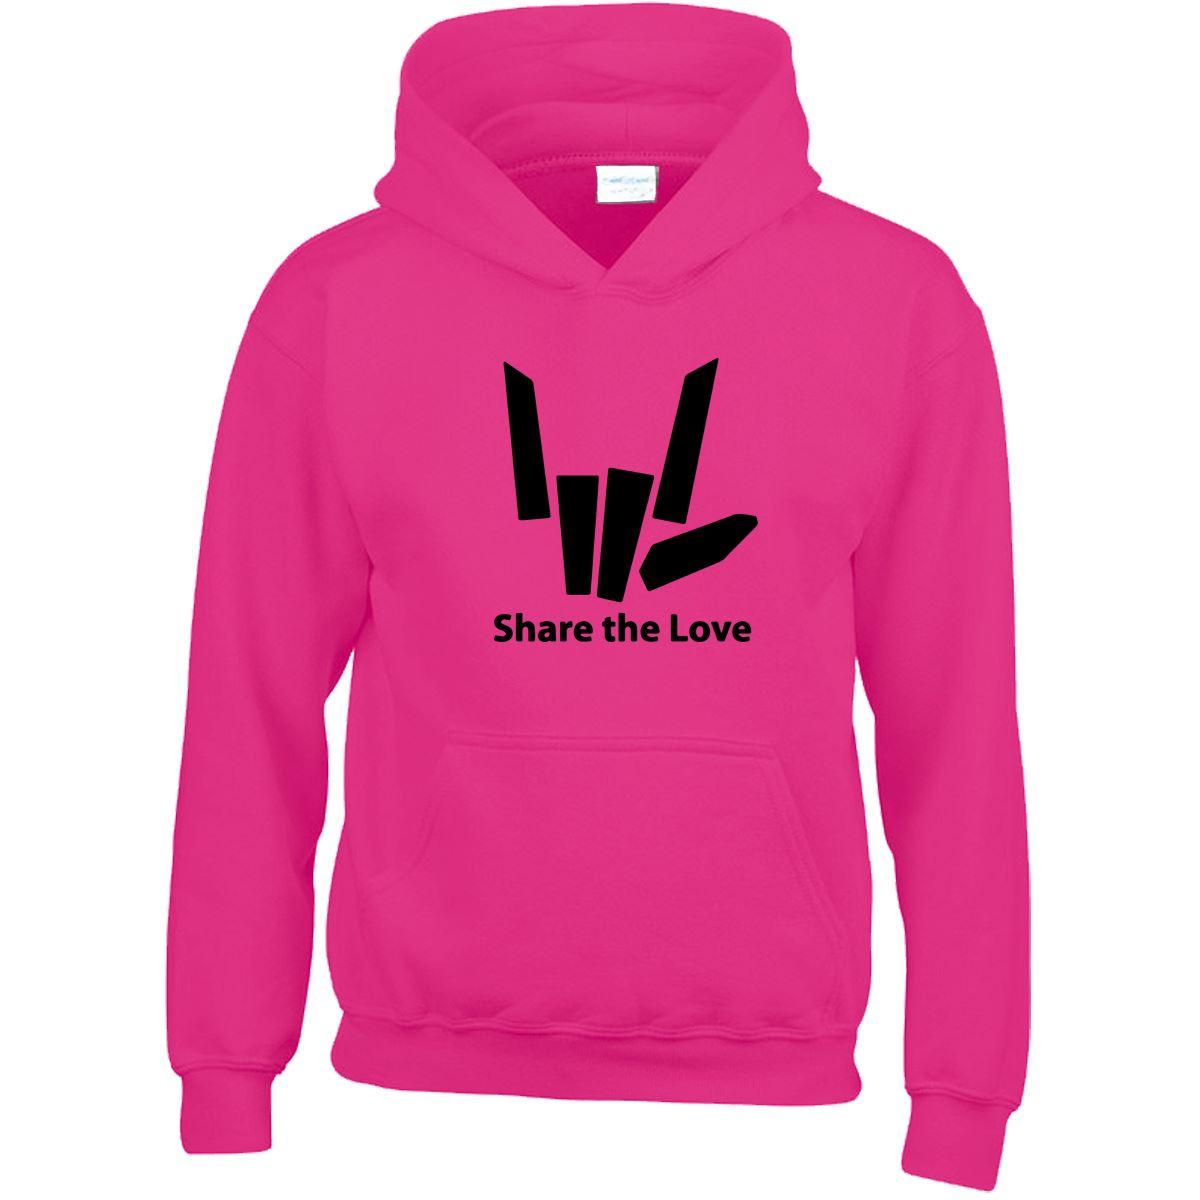 Share The Love Stephen Sharer Youtuber Mens Sweat Kids Girls Boys Sweatshirt